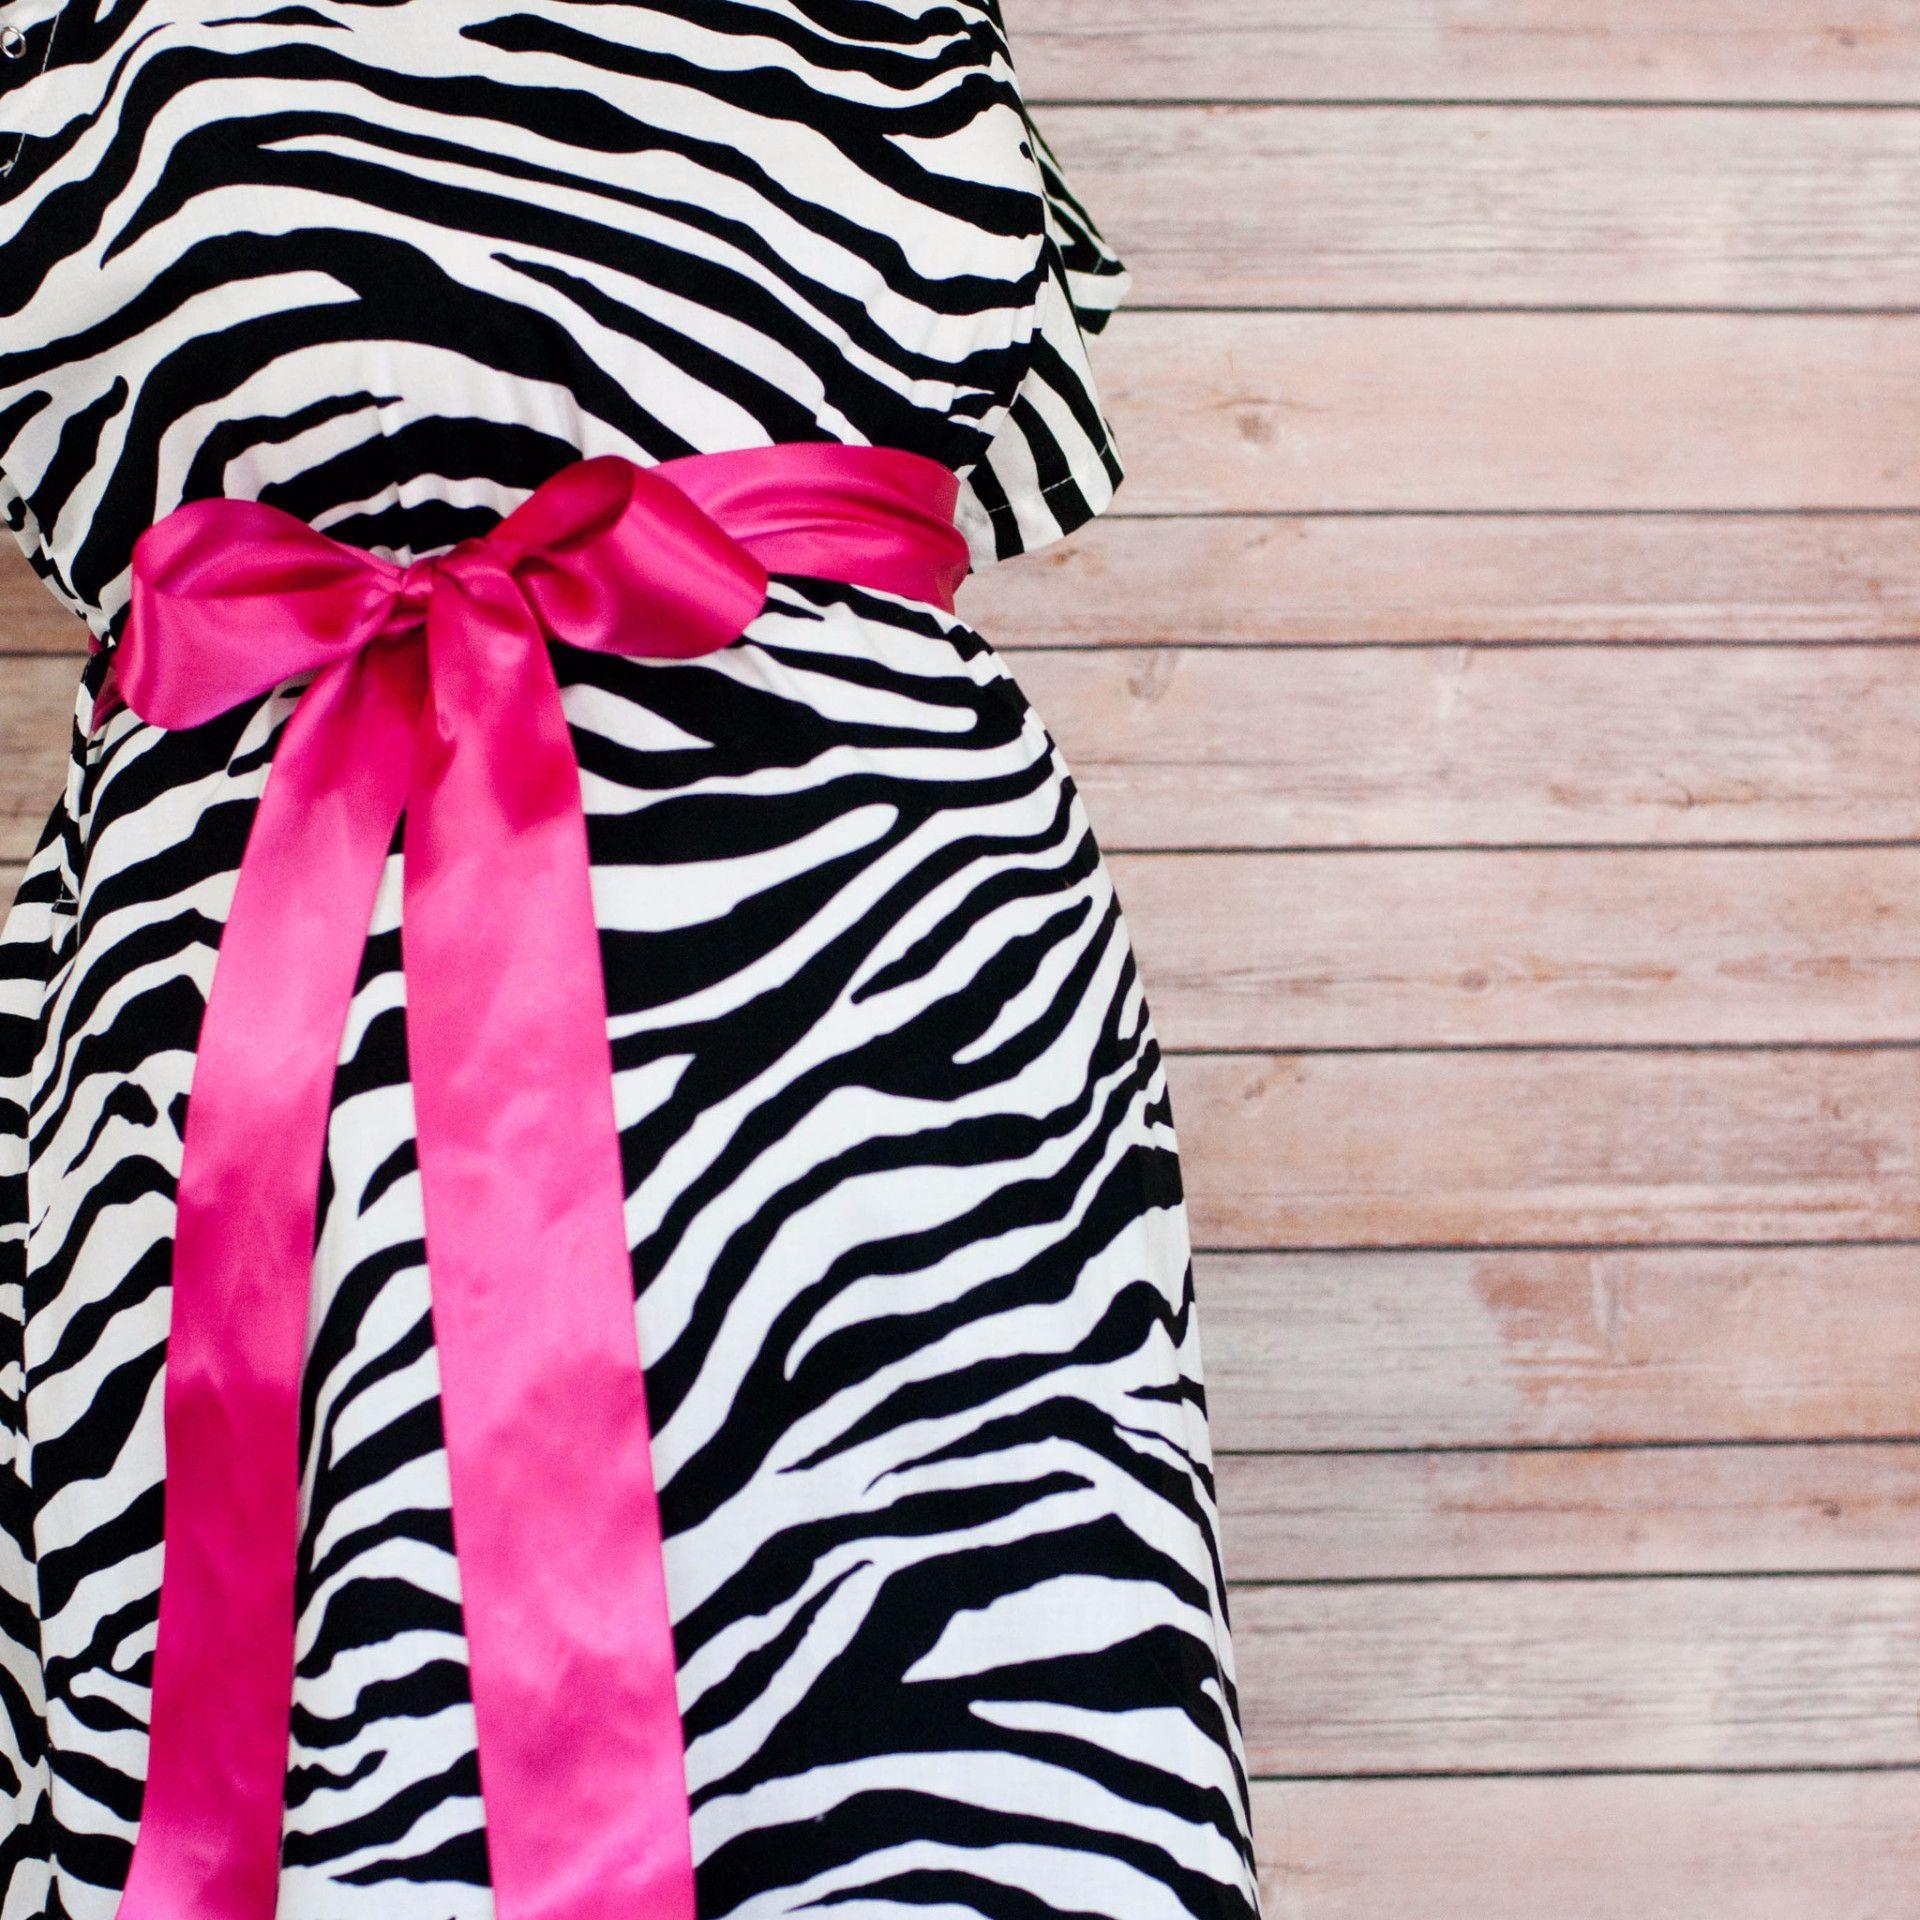 Zebra 40% OFF - Maternity Hospital Nursing & Delivery Gown ...